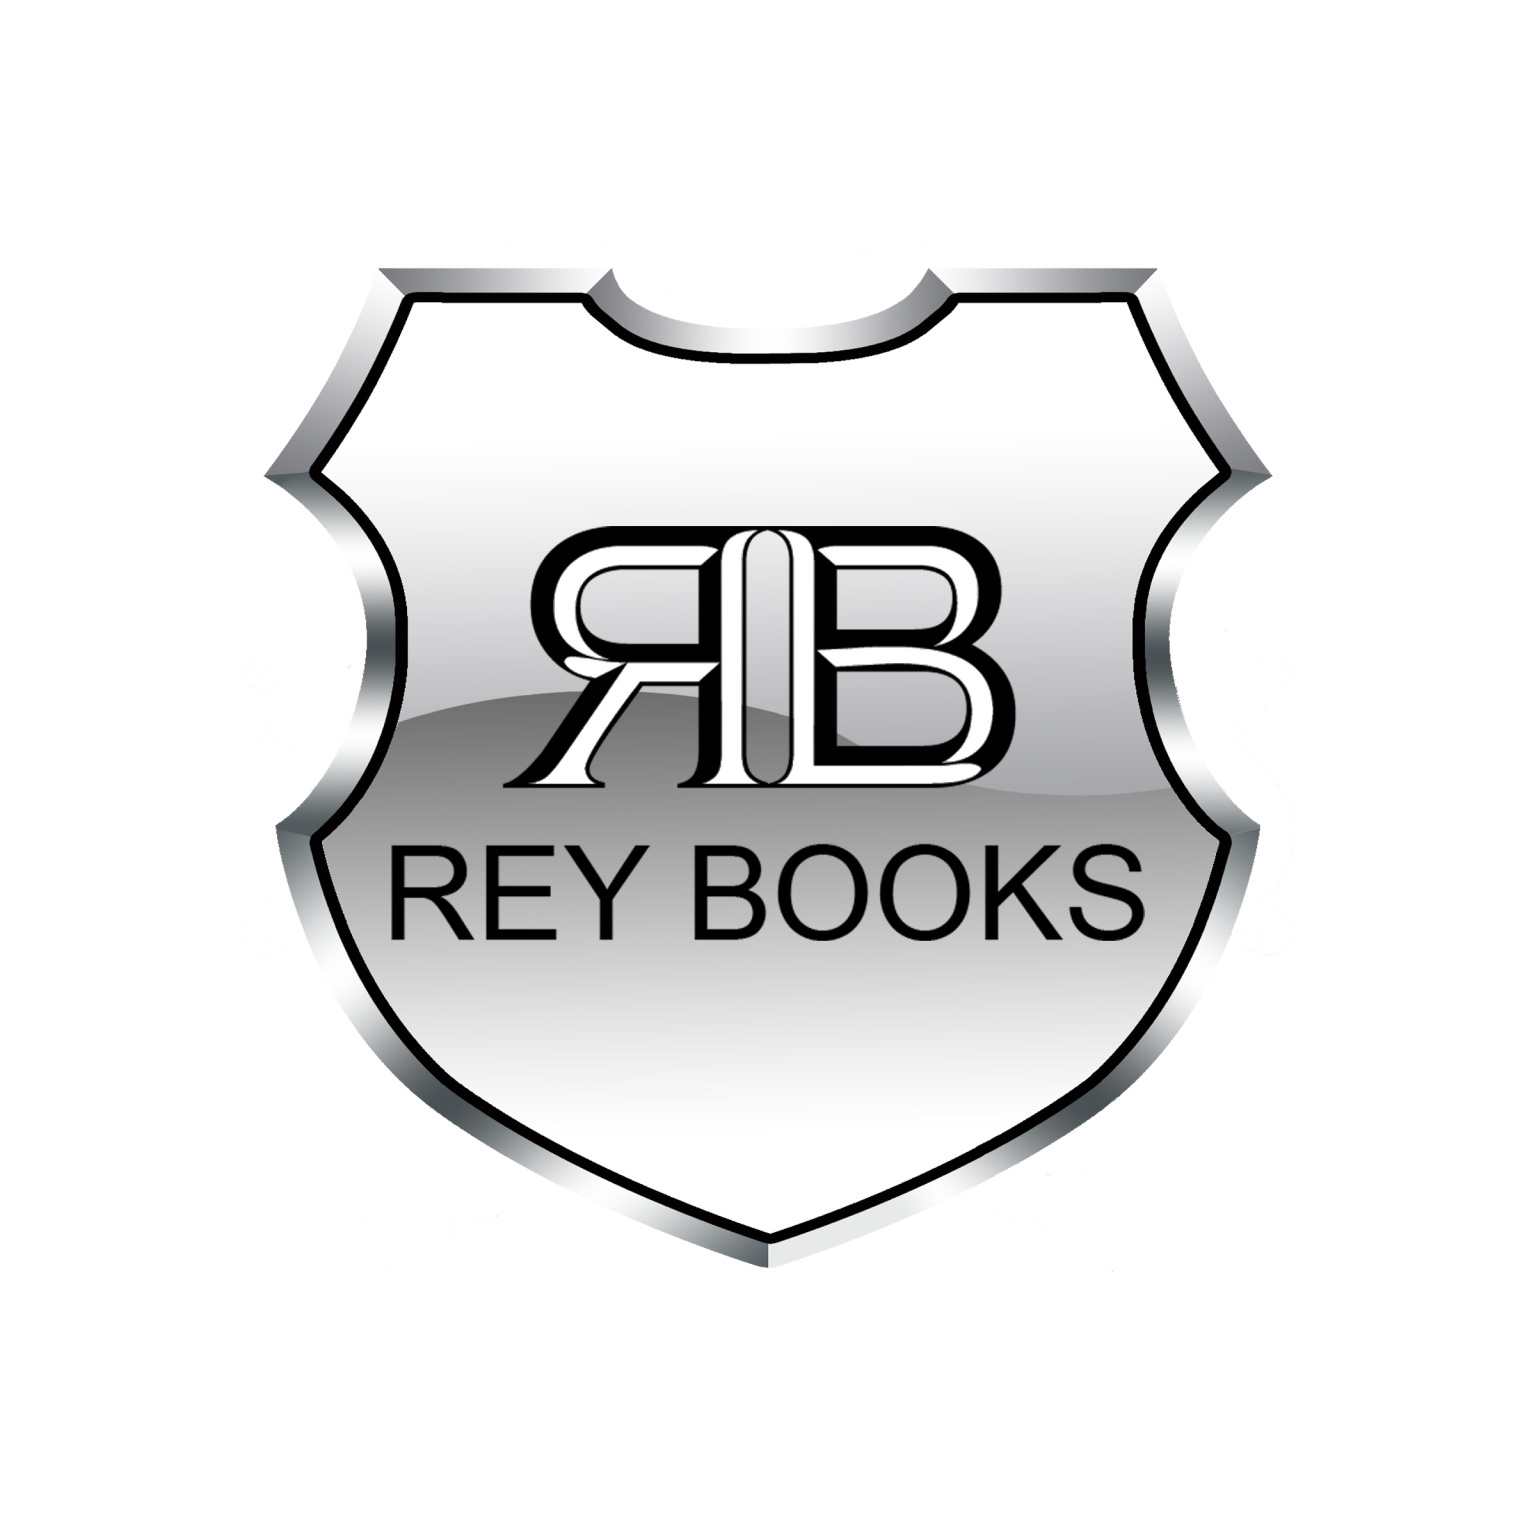 Official Rey Books logo